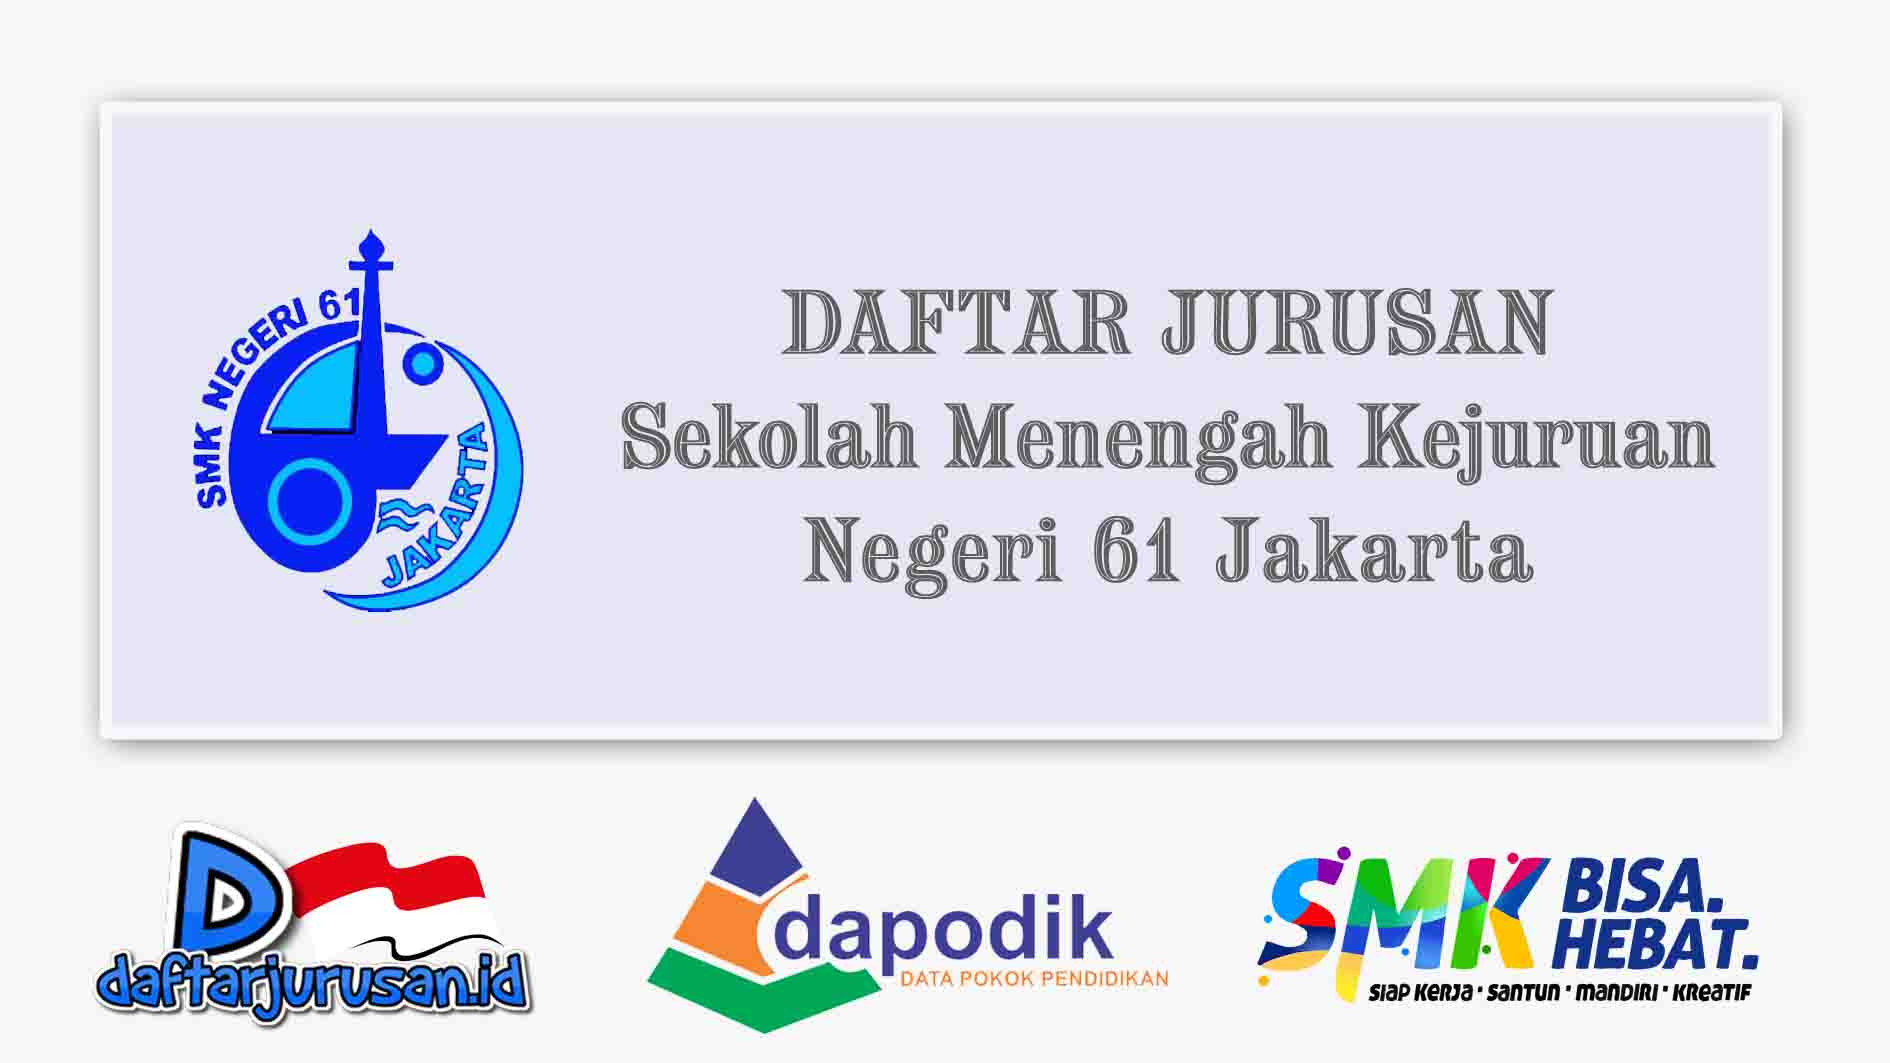 Daftar Jurusan SMK Negeri 61 Jakarta